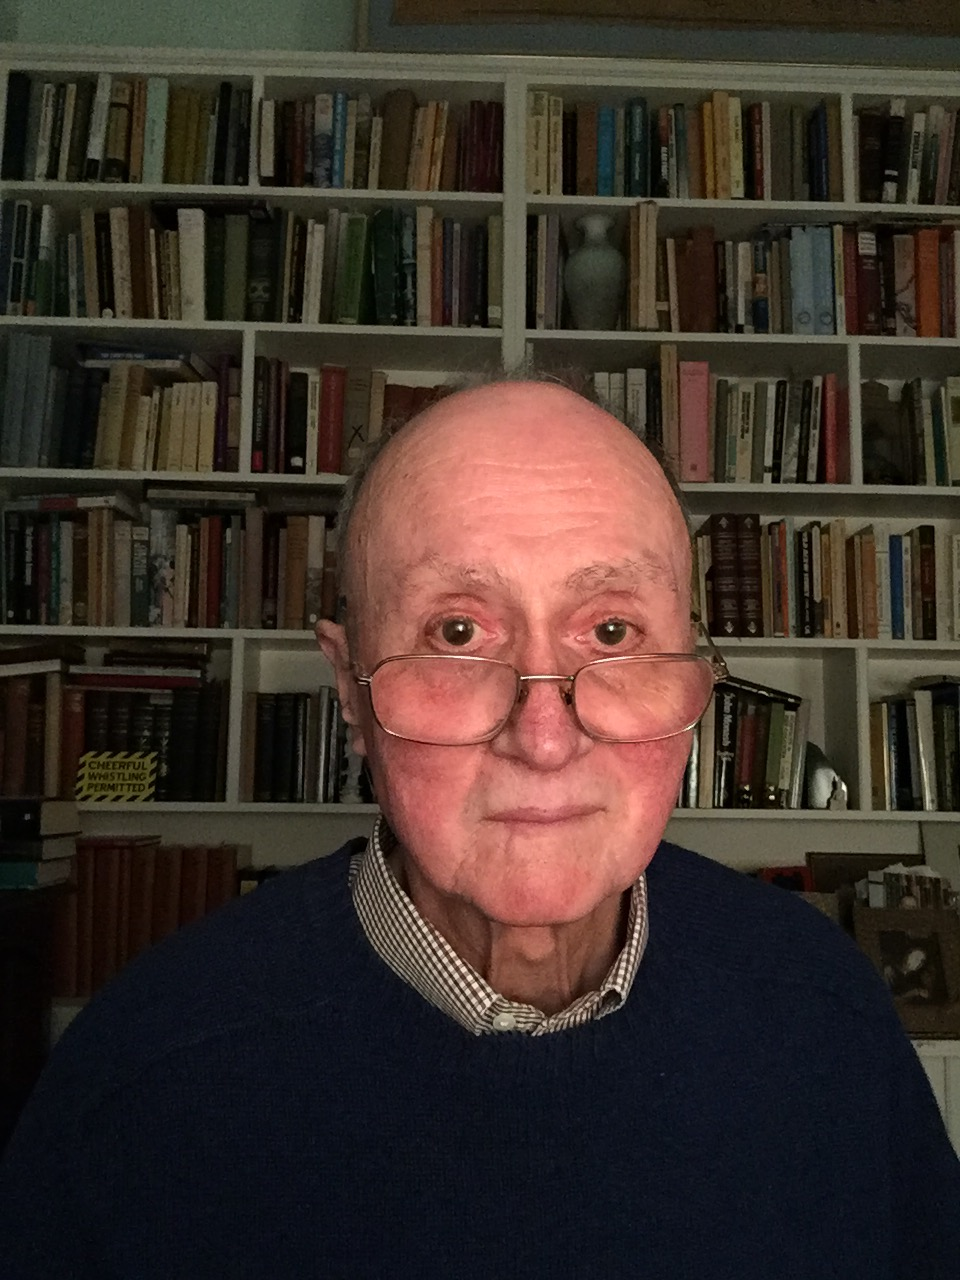 Professor Jonathan Pincus